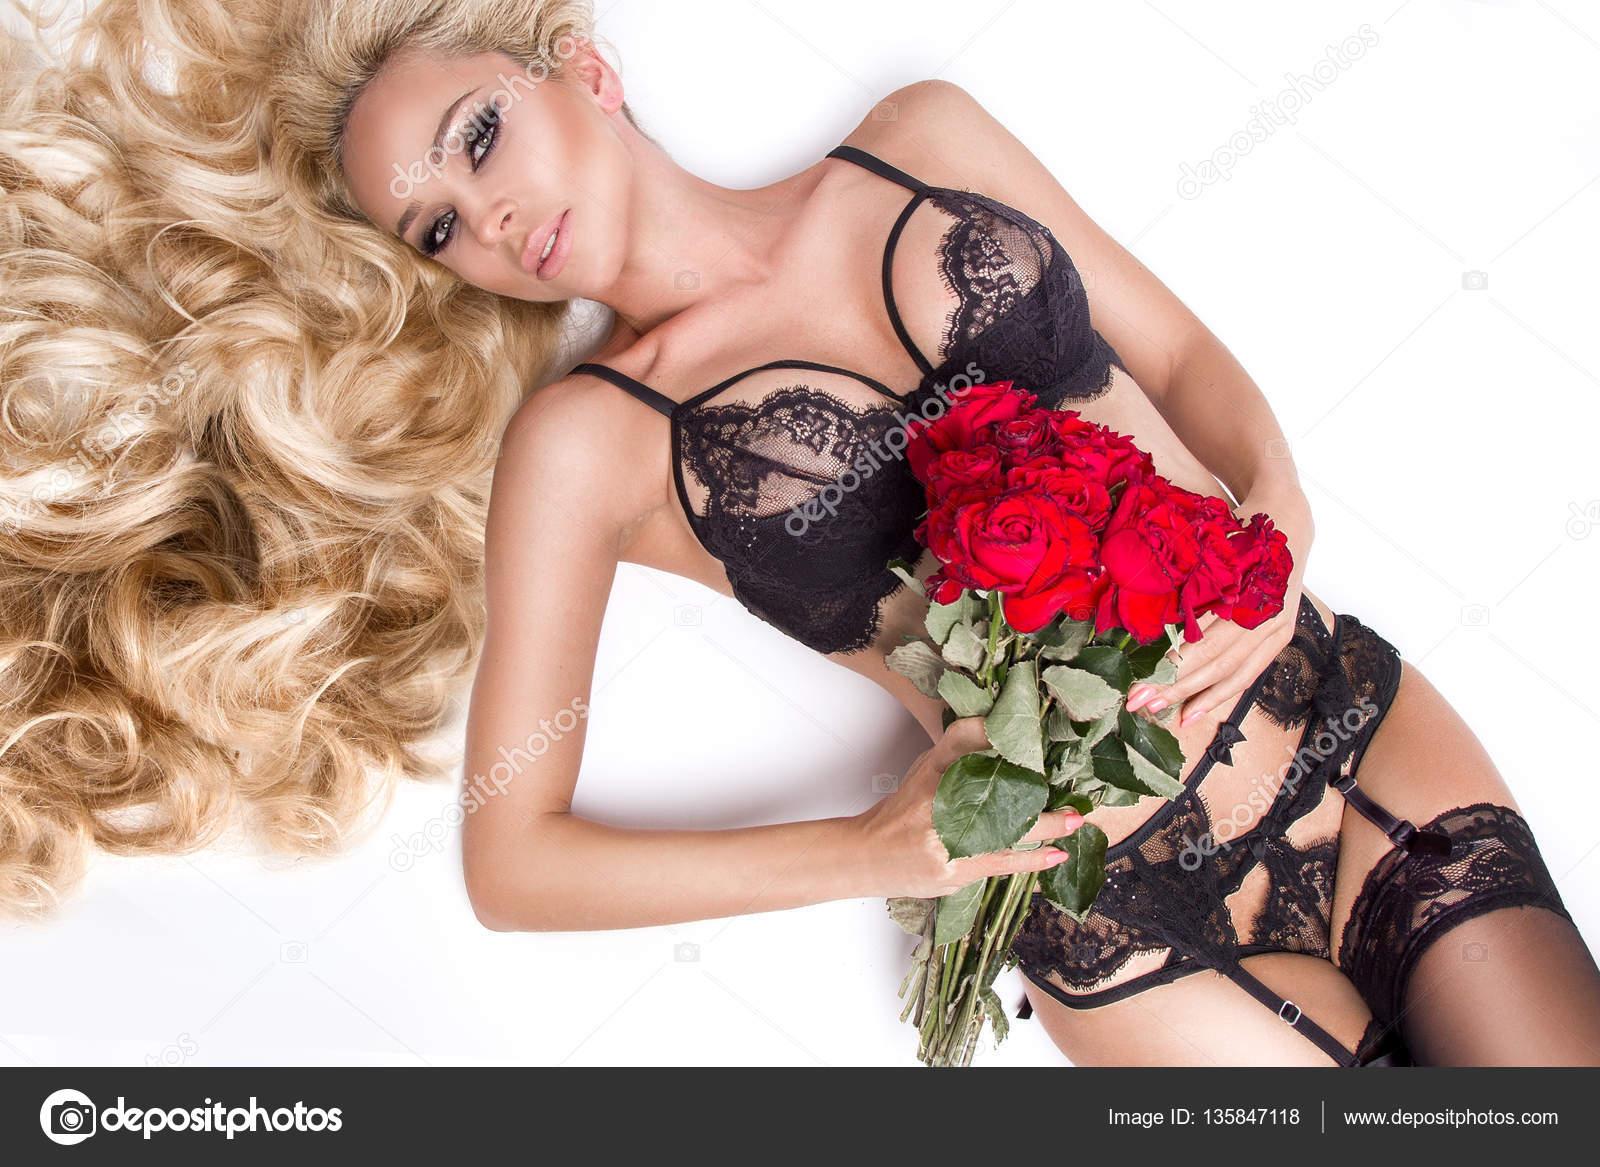 Aşk Varsa Seks Harika